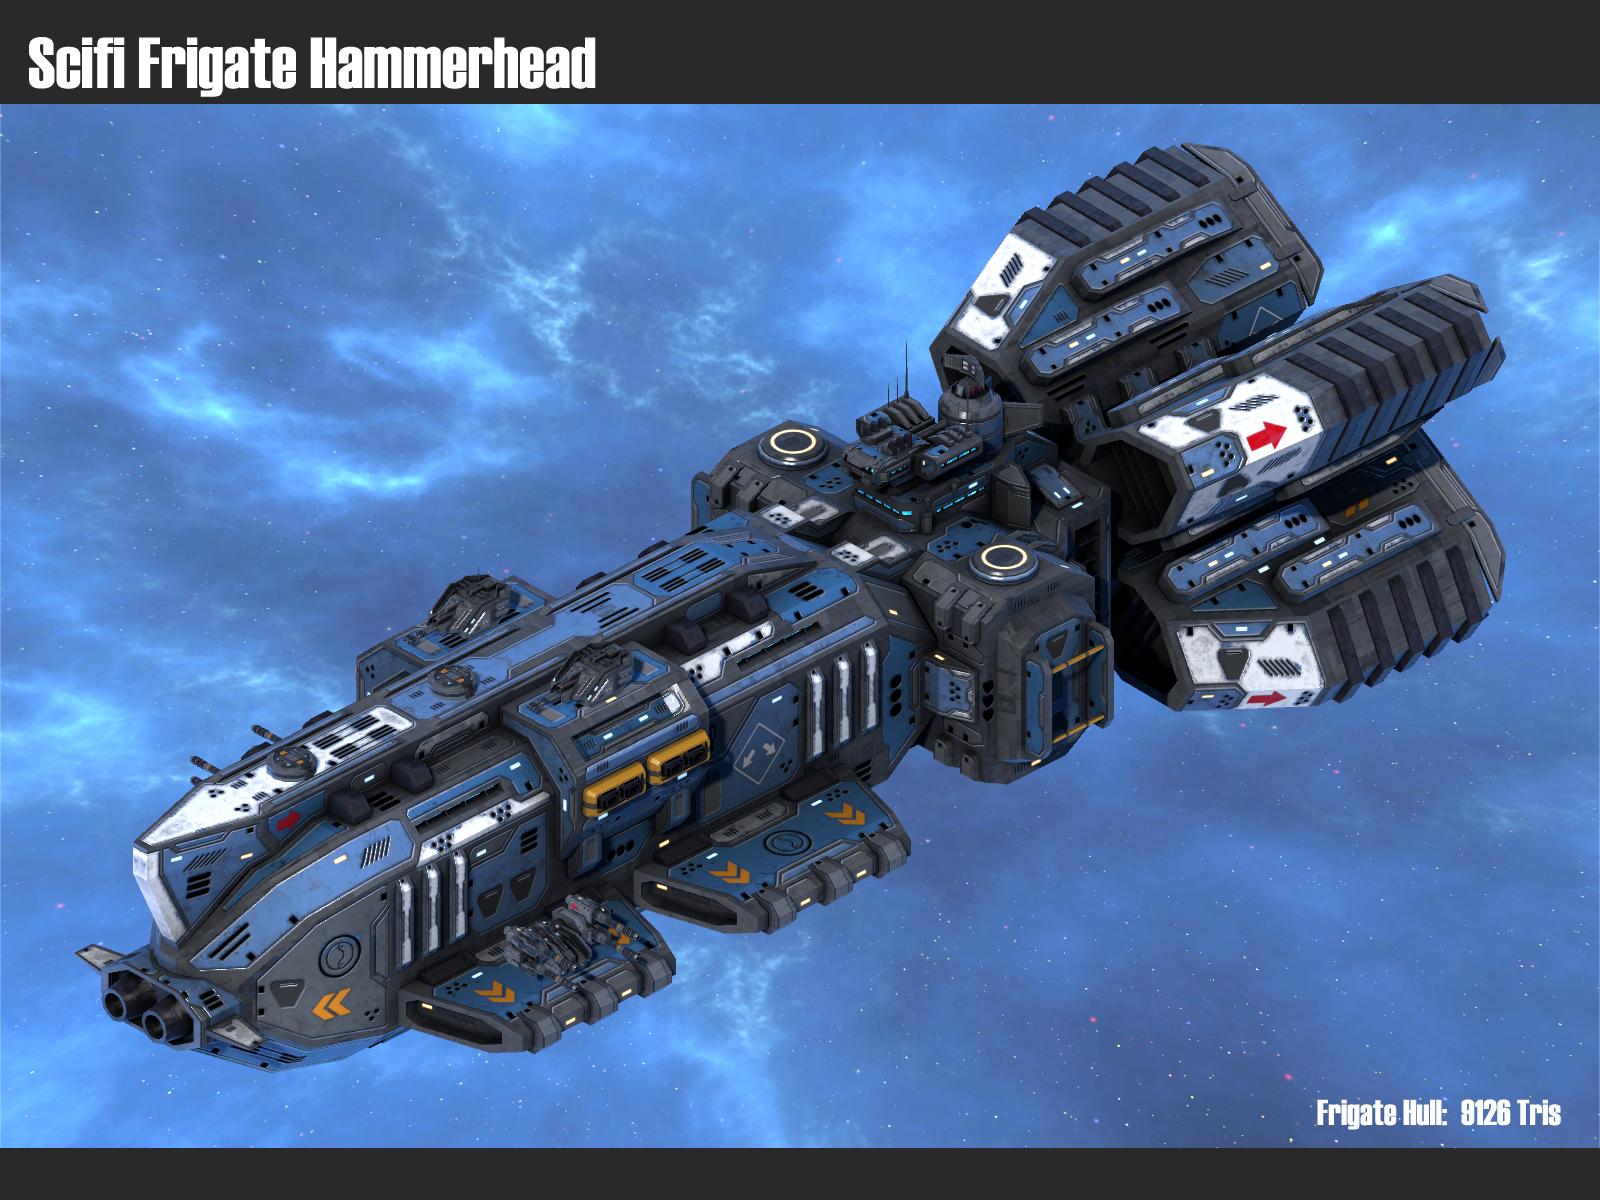 Scifi Frigate Hammerhead